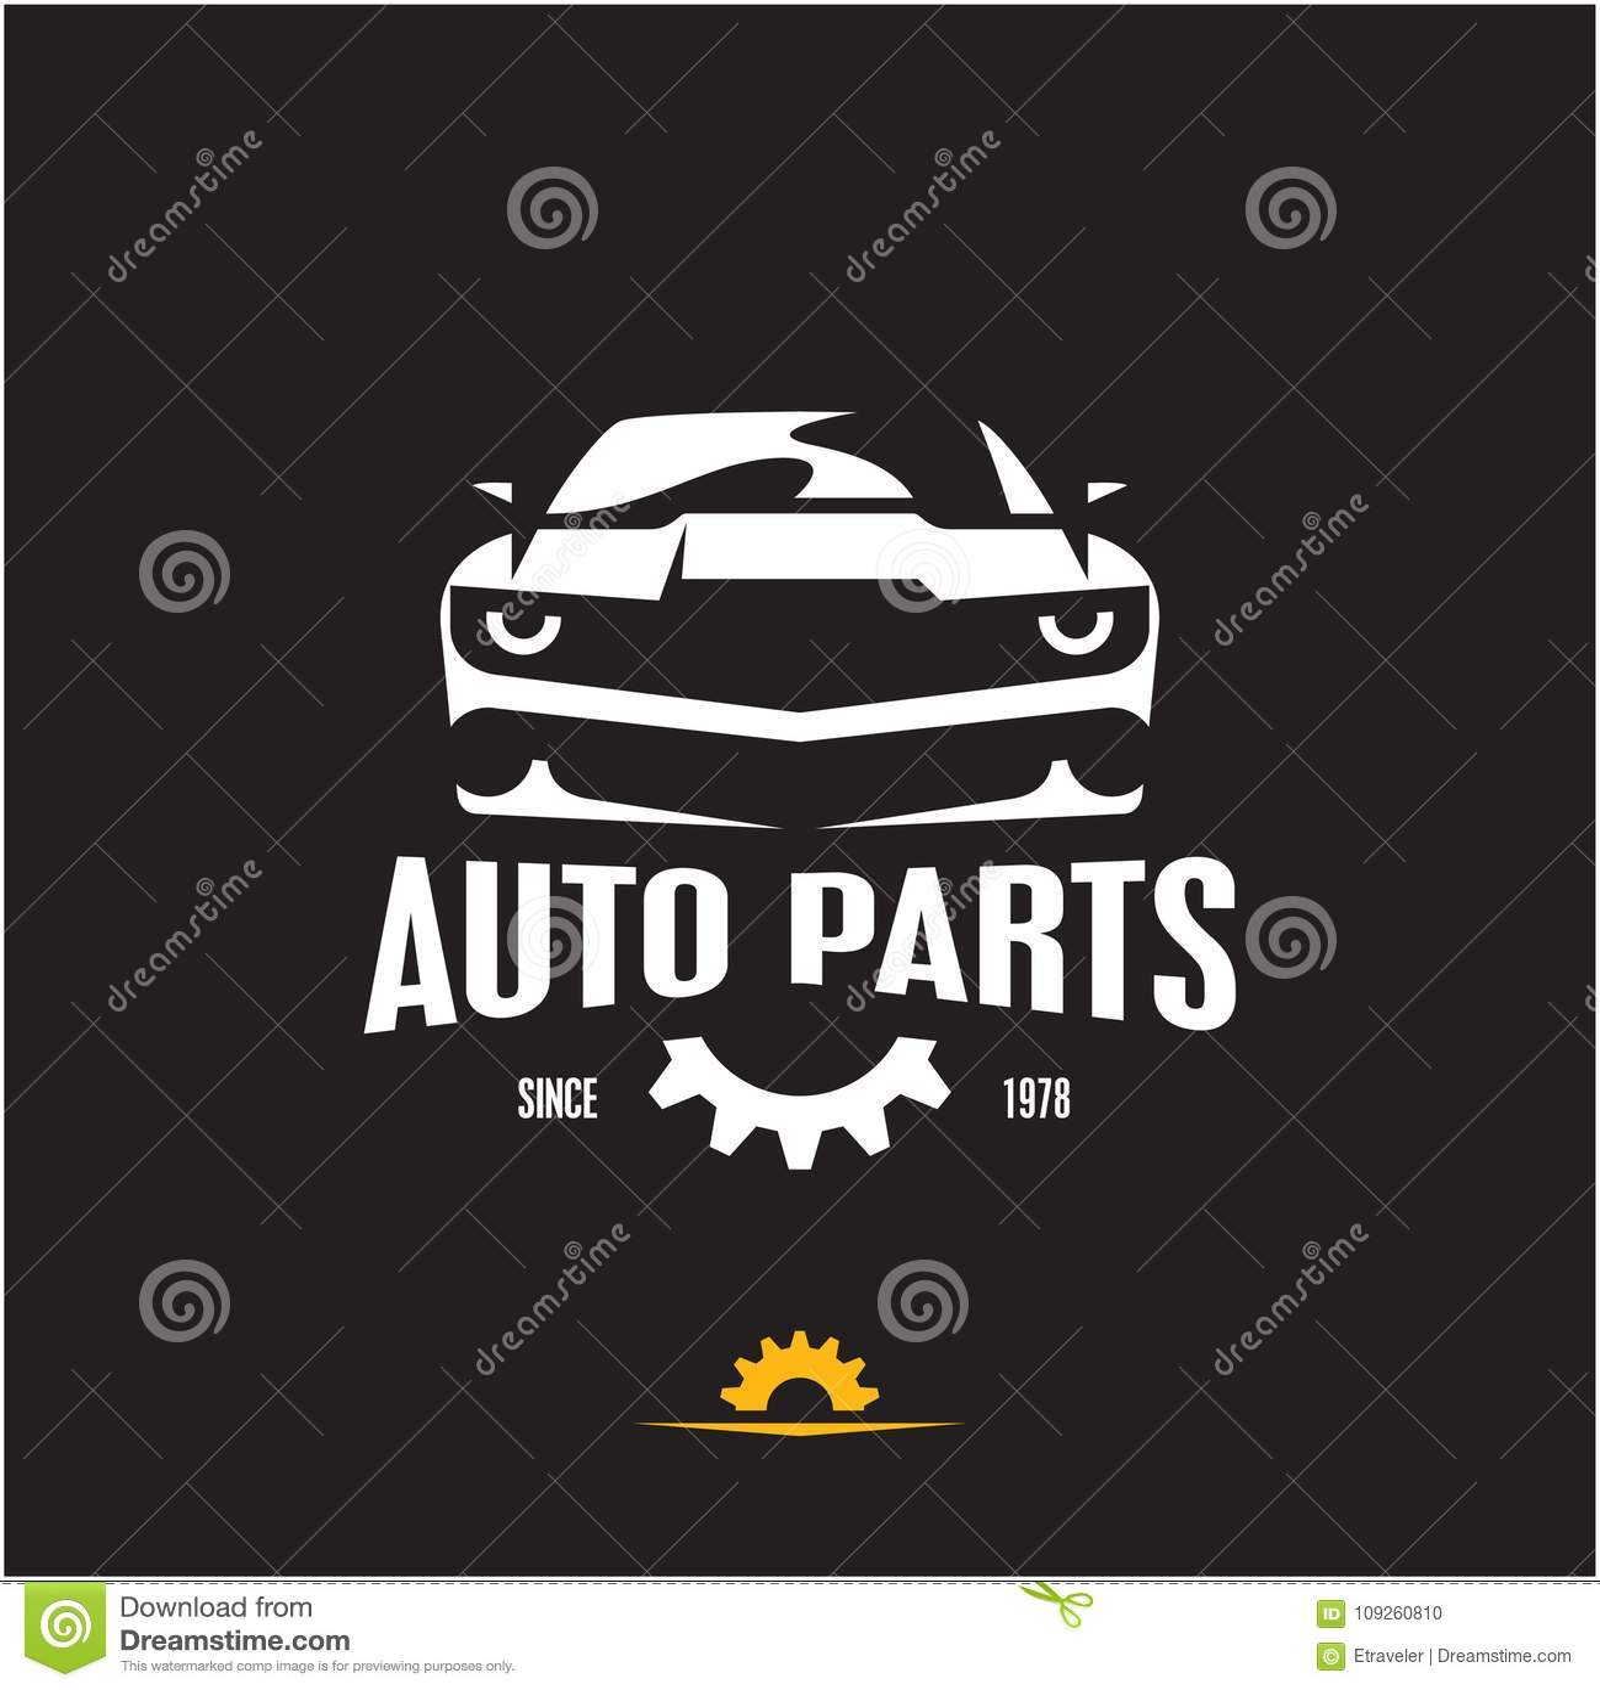 Car Parts Icon, Auto Parts Label, Sports Car Silhouette Stock Vector ...